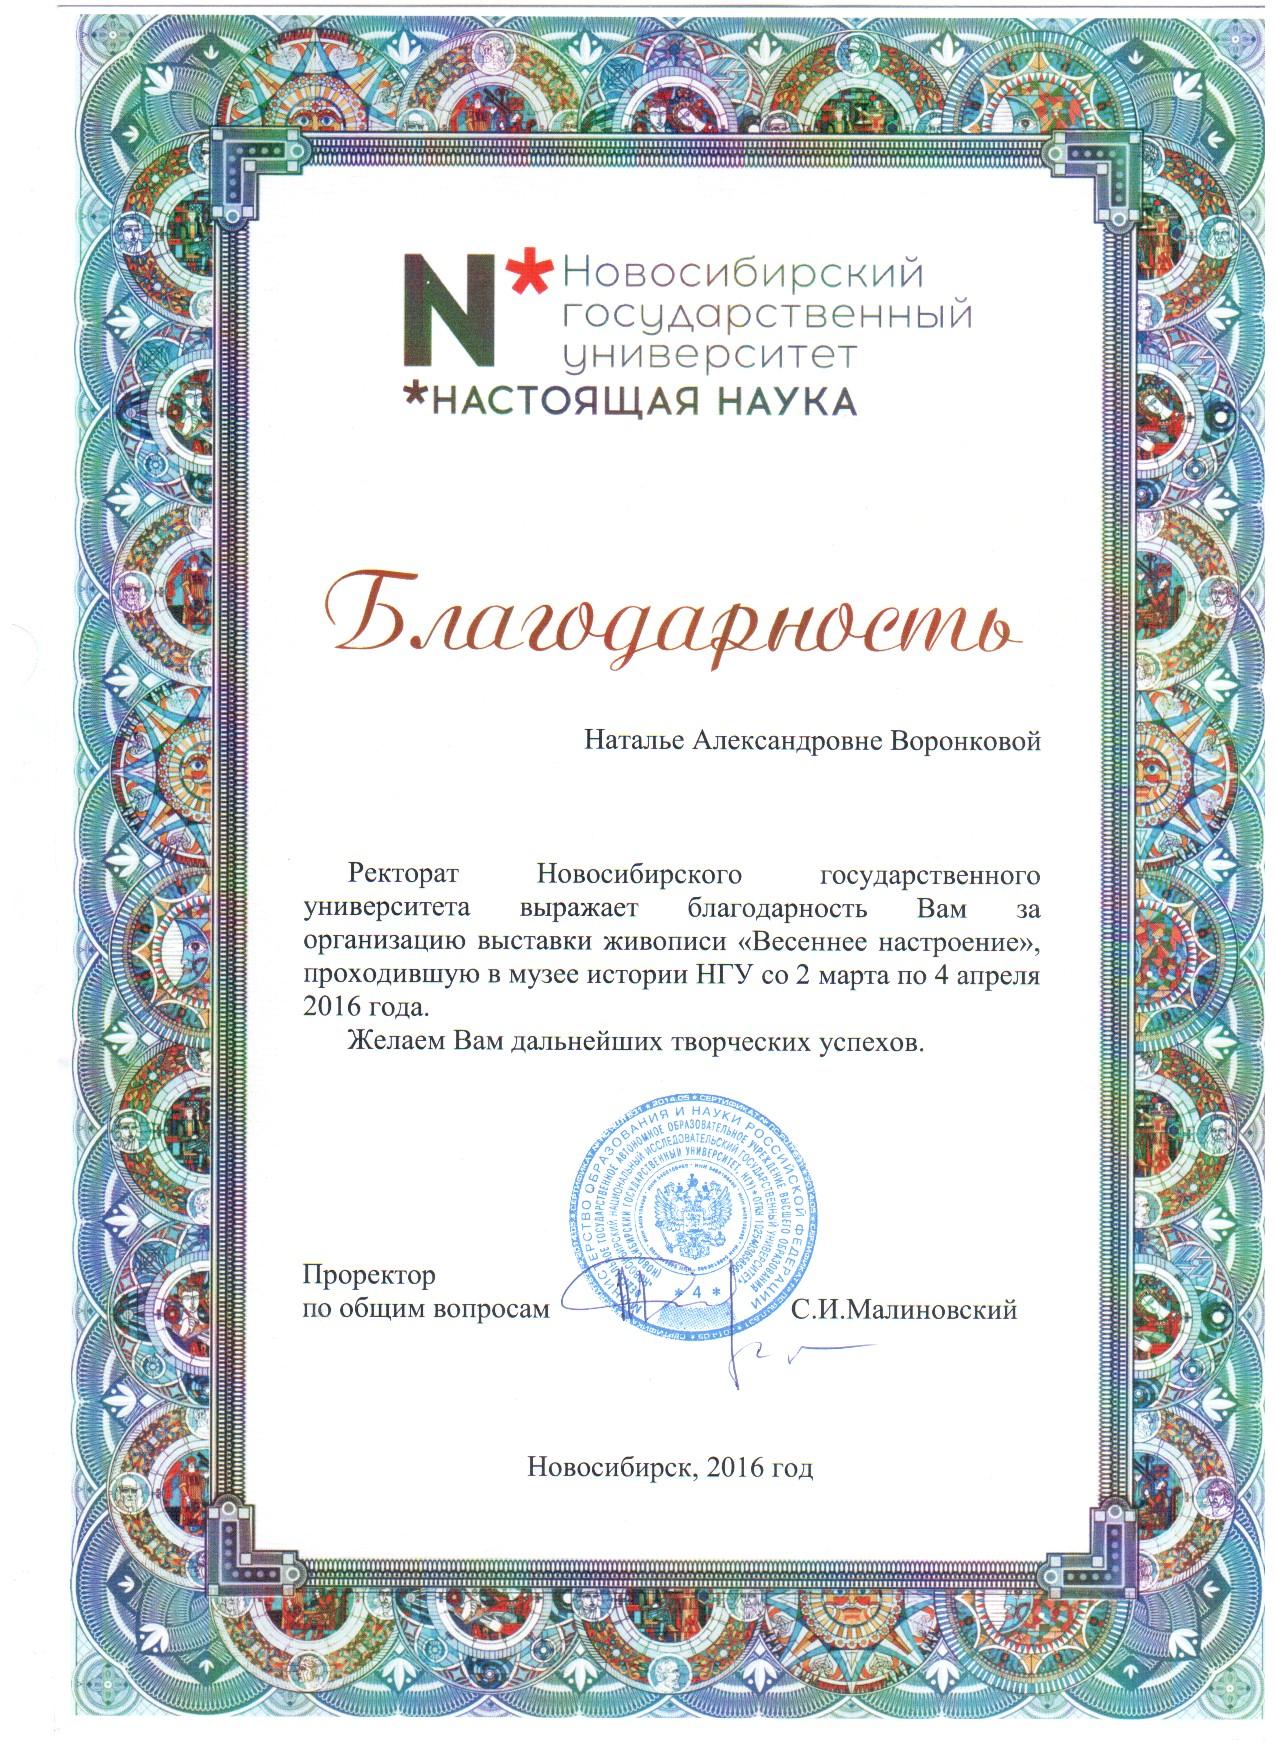 НГУ-2016